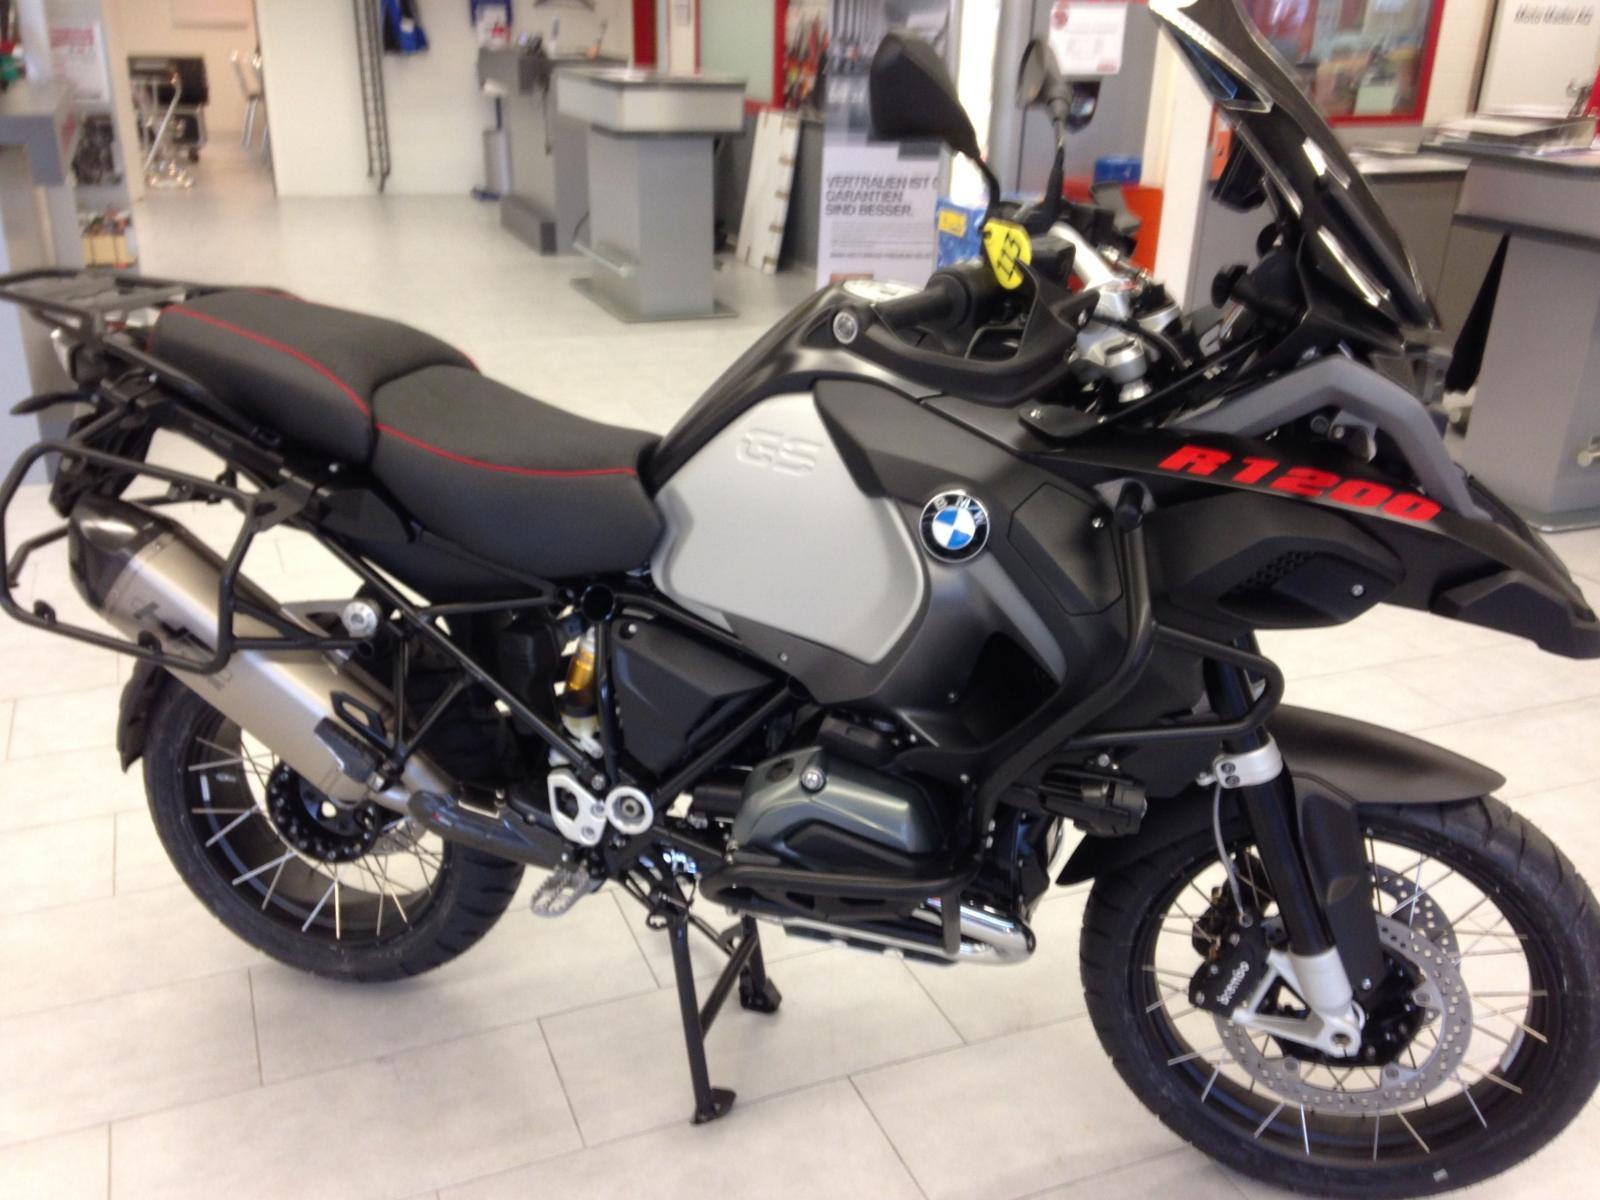 r1200gsa-lc-1-moto-mader.jpg